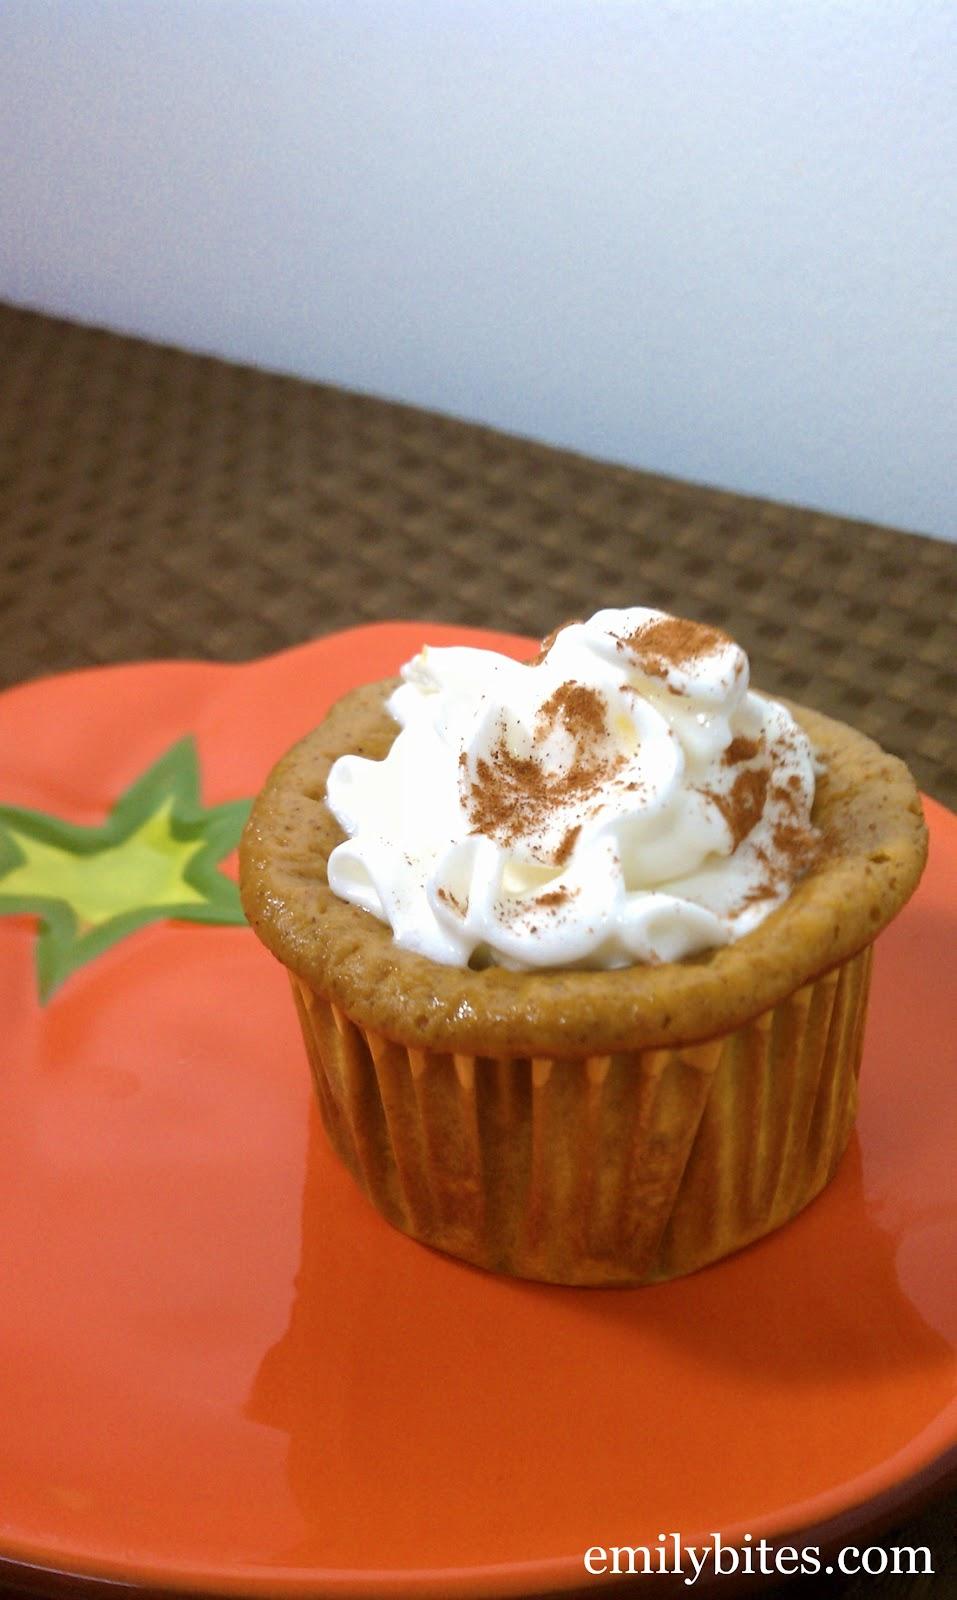 Crustless Mini Pumpkin Pies - Emily Bites